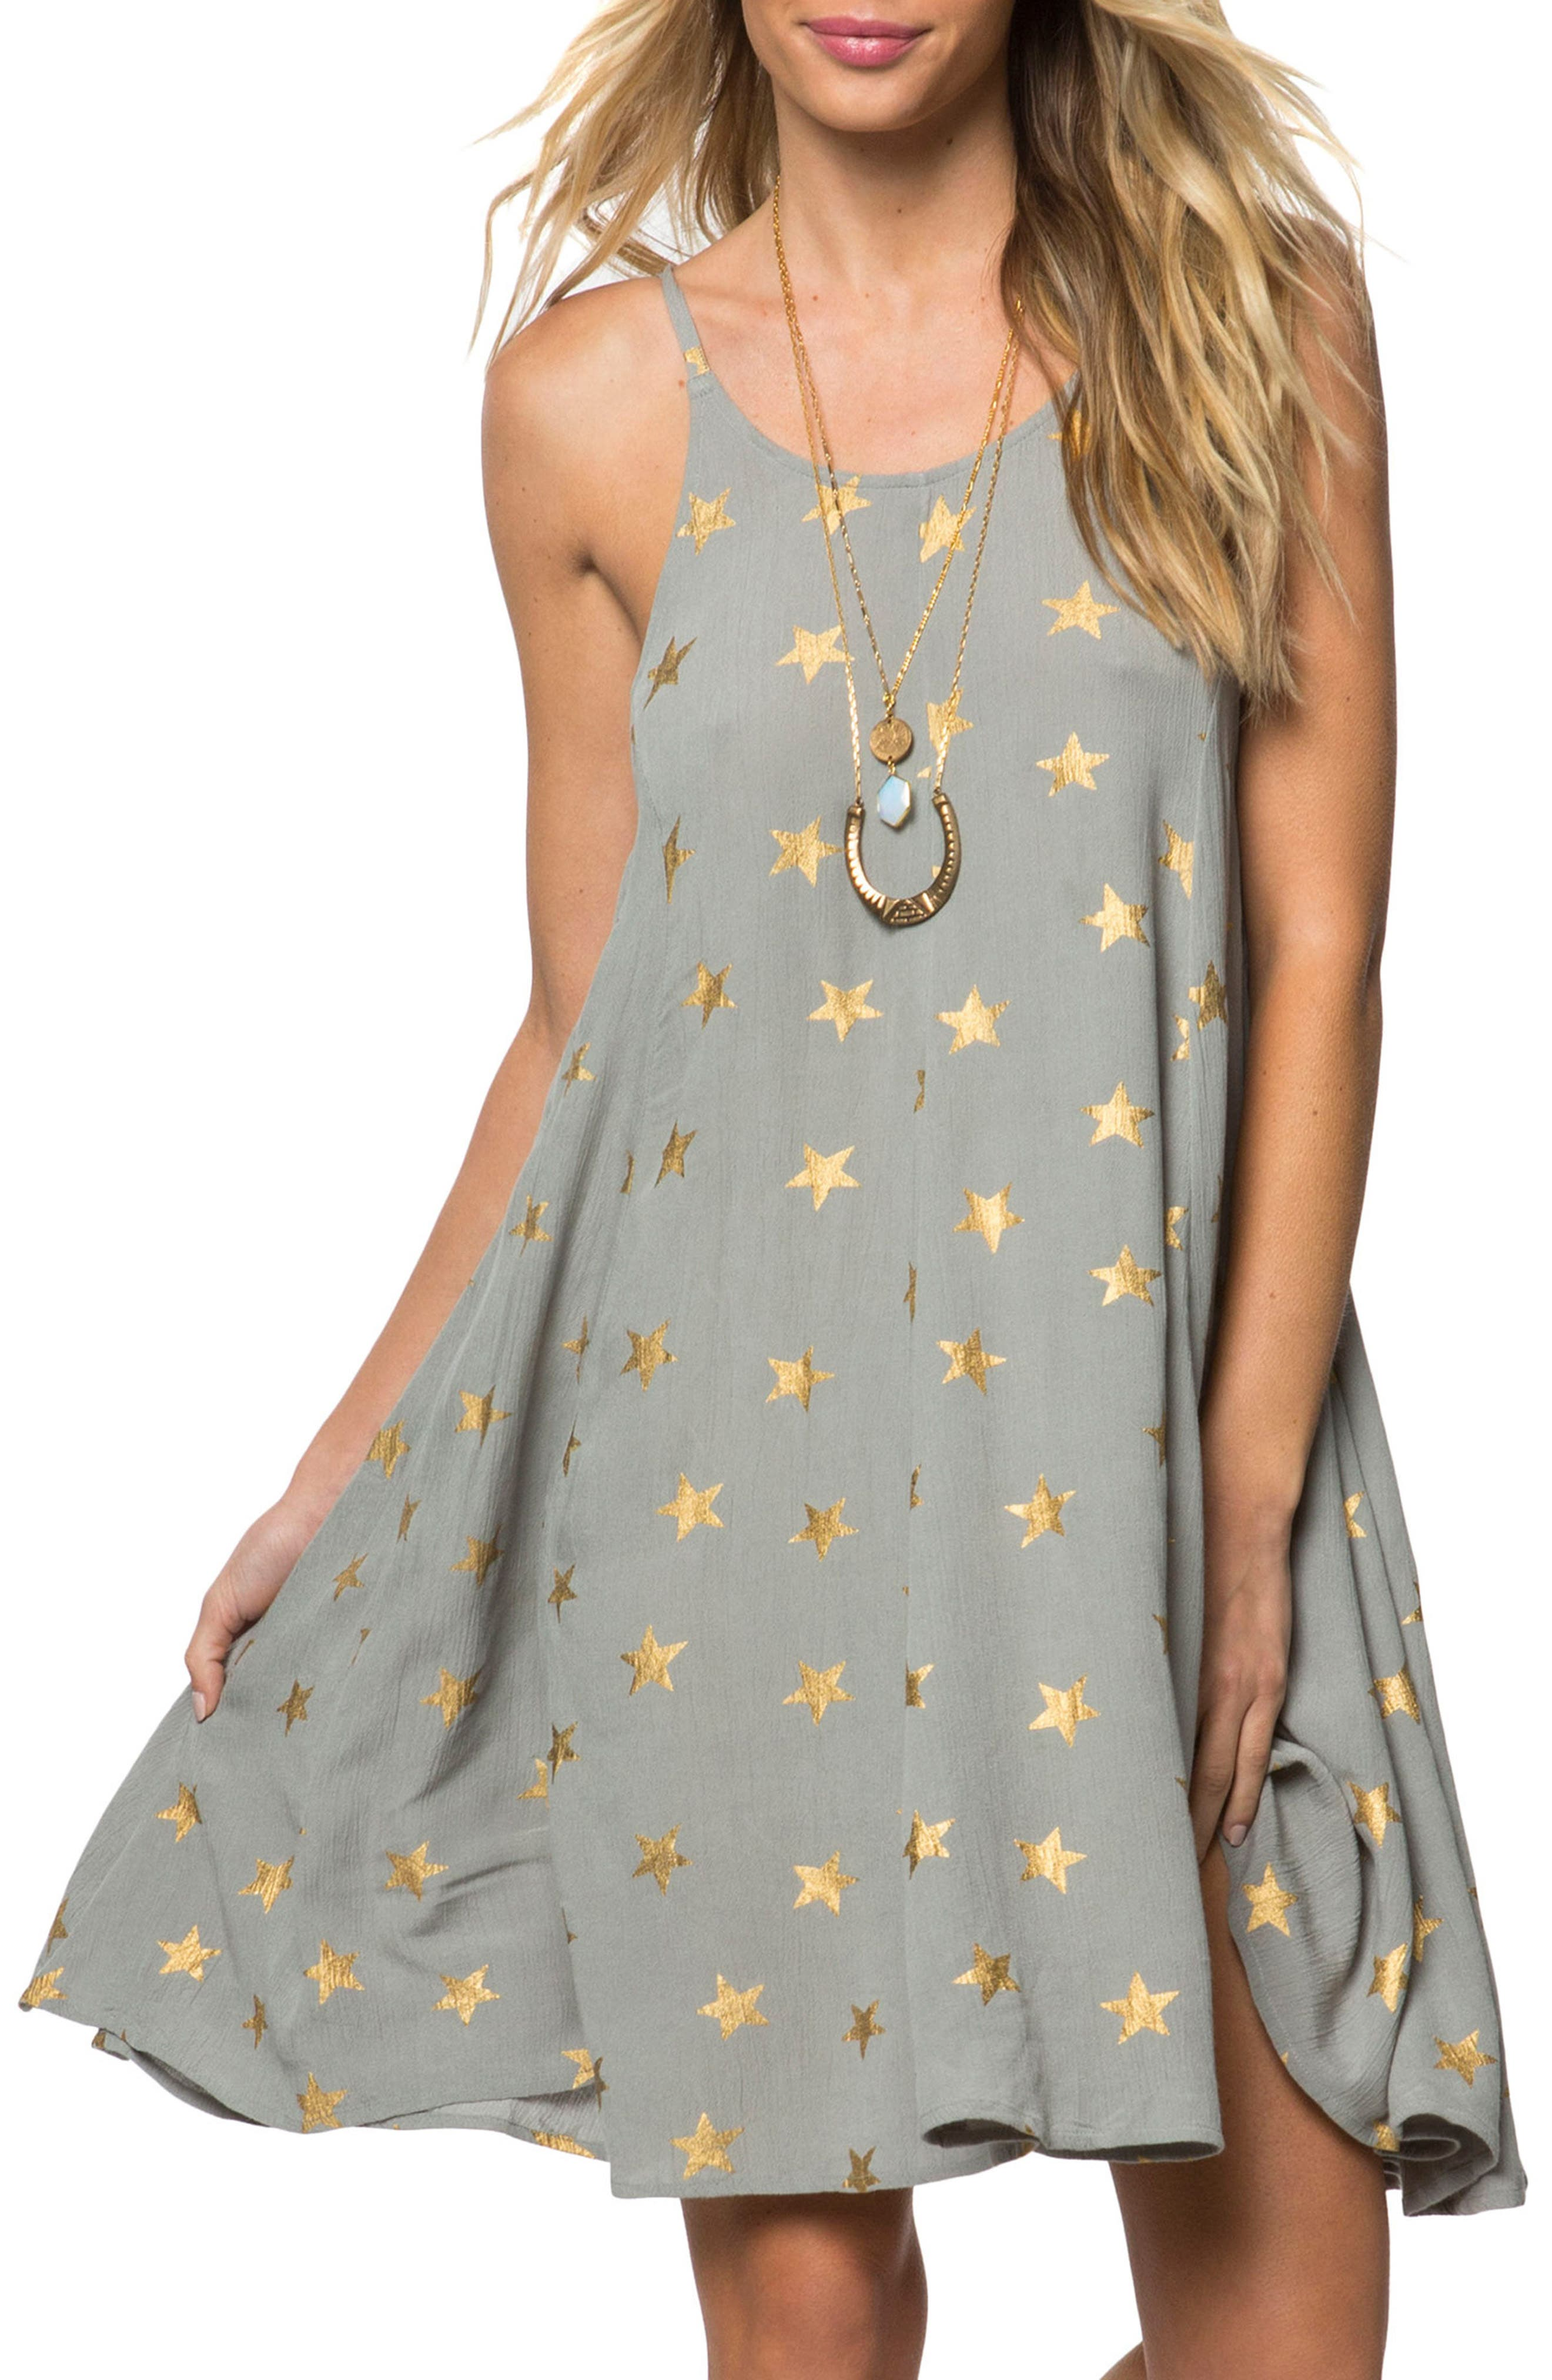 Alternate Image 1 Selected - O'Neill Faye Star Print Dress